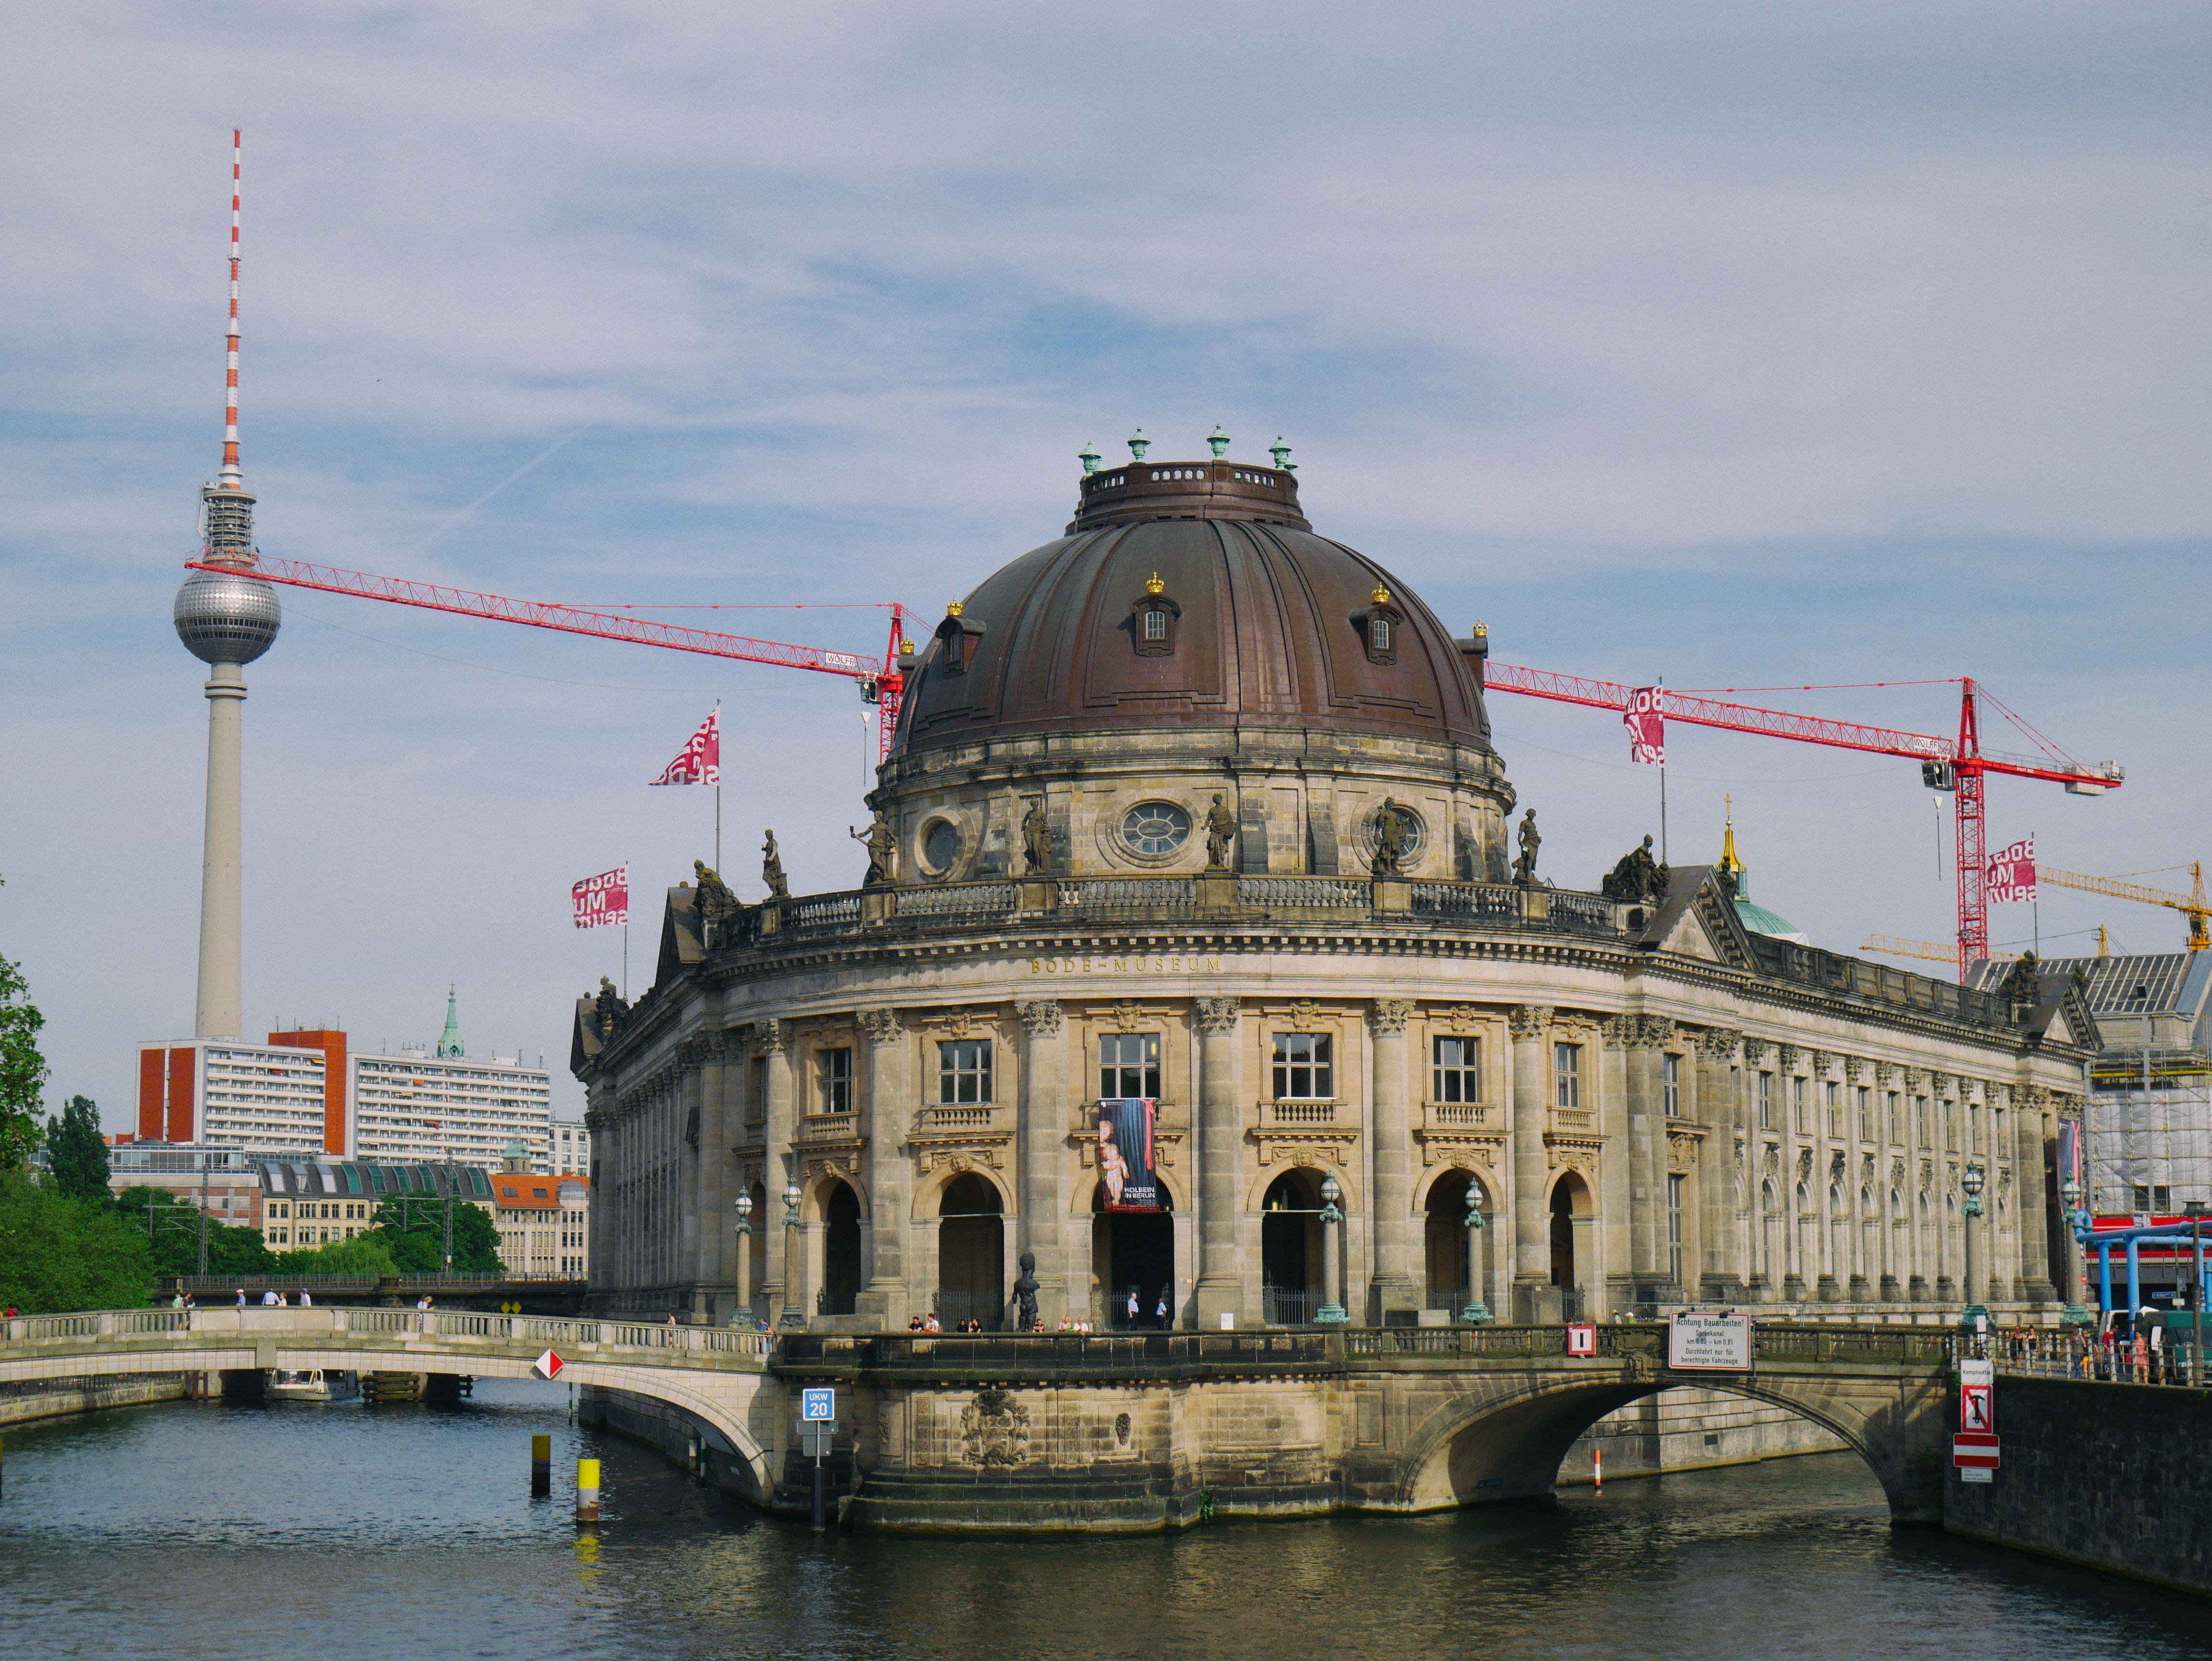 Germania: definitivi Berlino, Afd 14,2%. Crollo Spd-Cdu